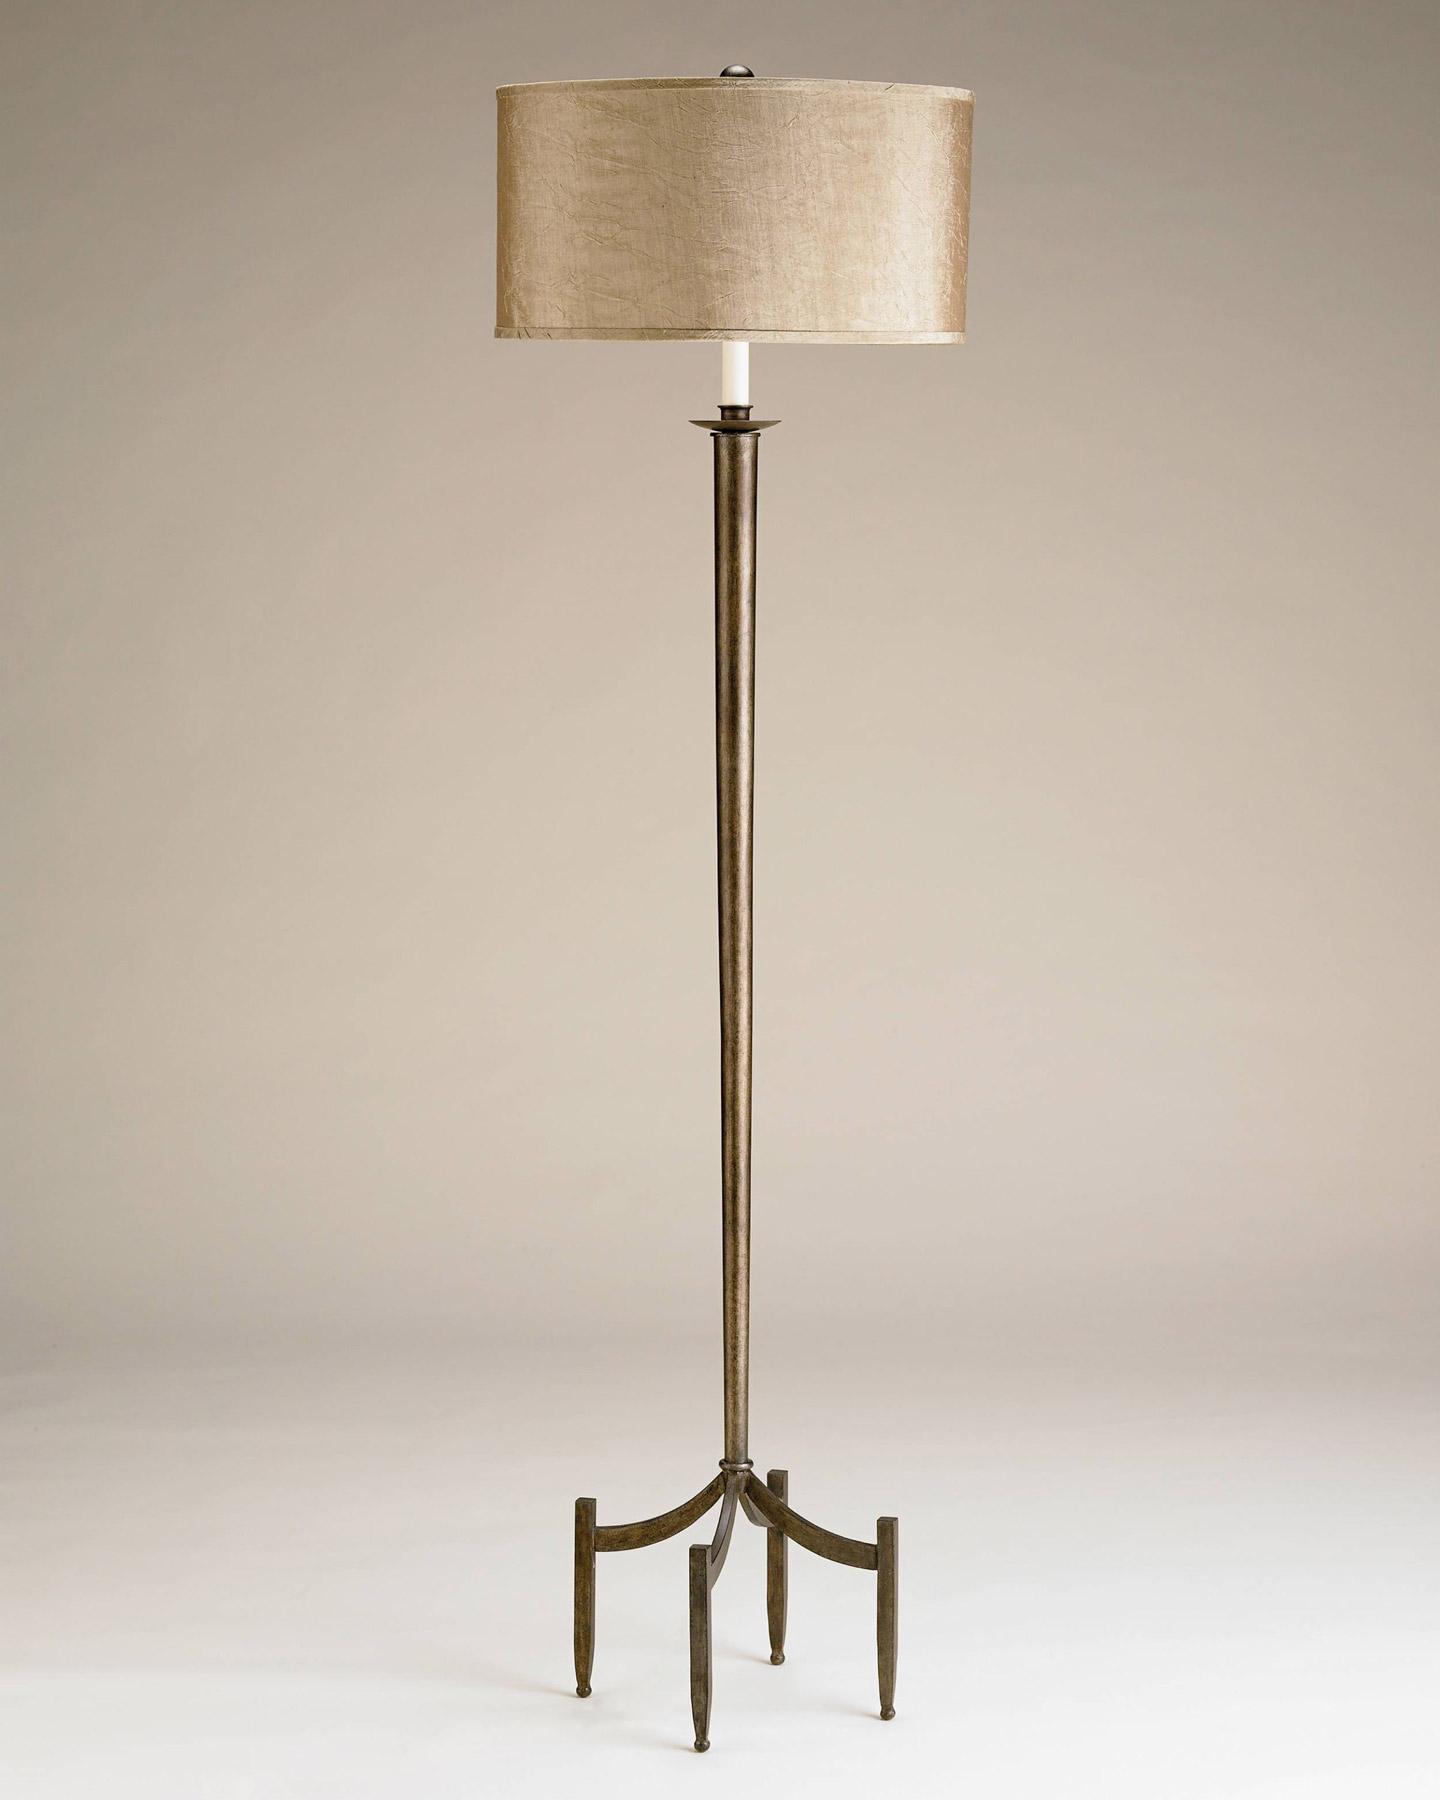 lamps floor lamps standard floor lamps currey and company. Black Bedroom Furniture Sets. Home Design Ideas